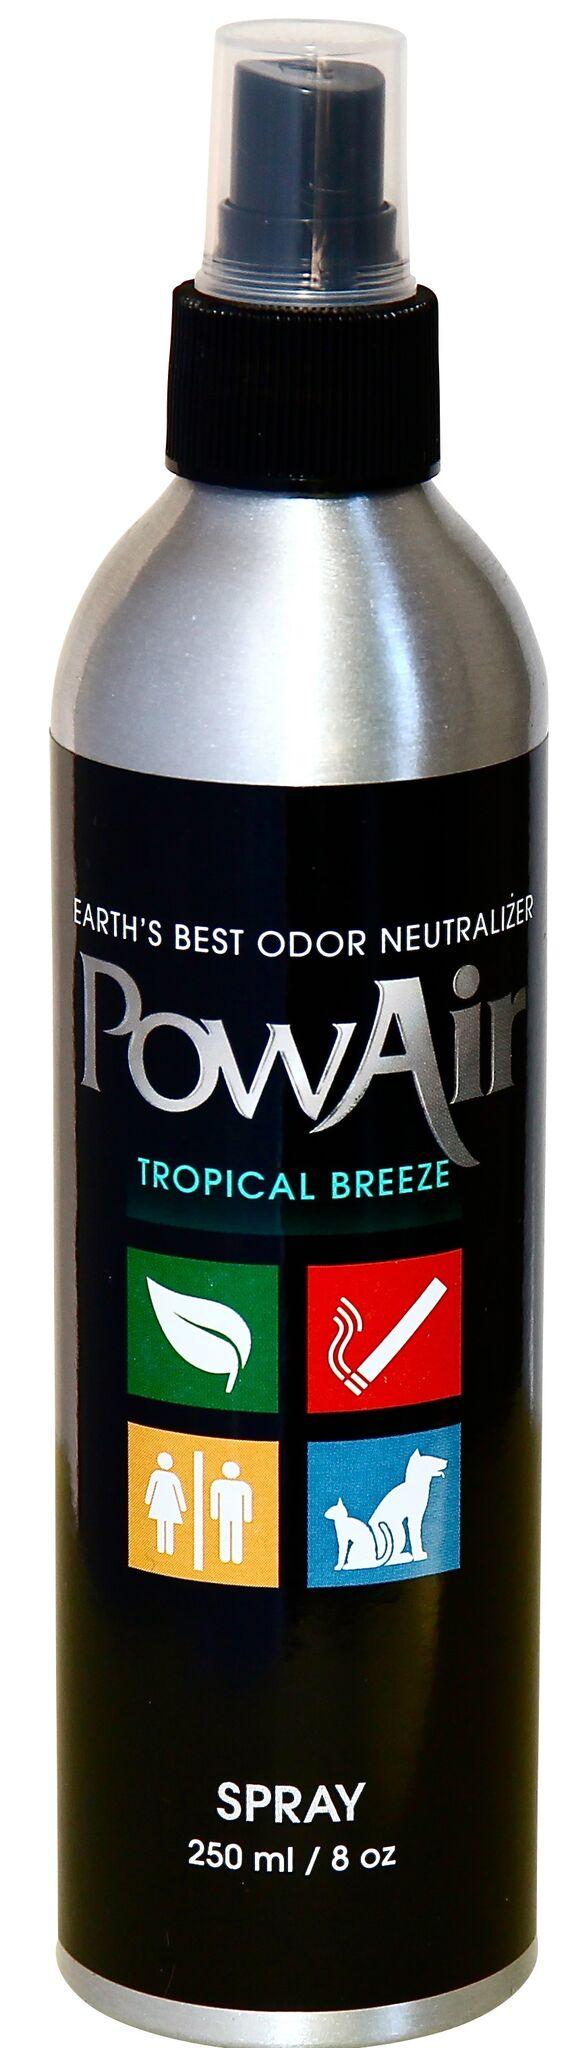 Powair Spray Tropical breeze 250 ml